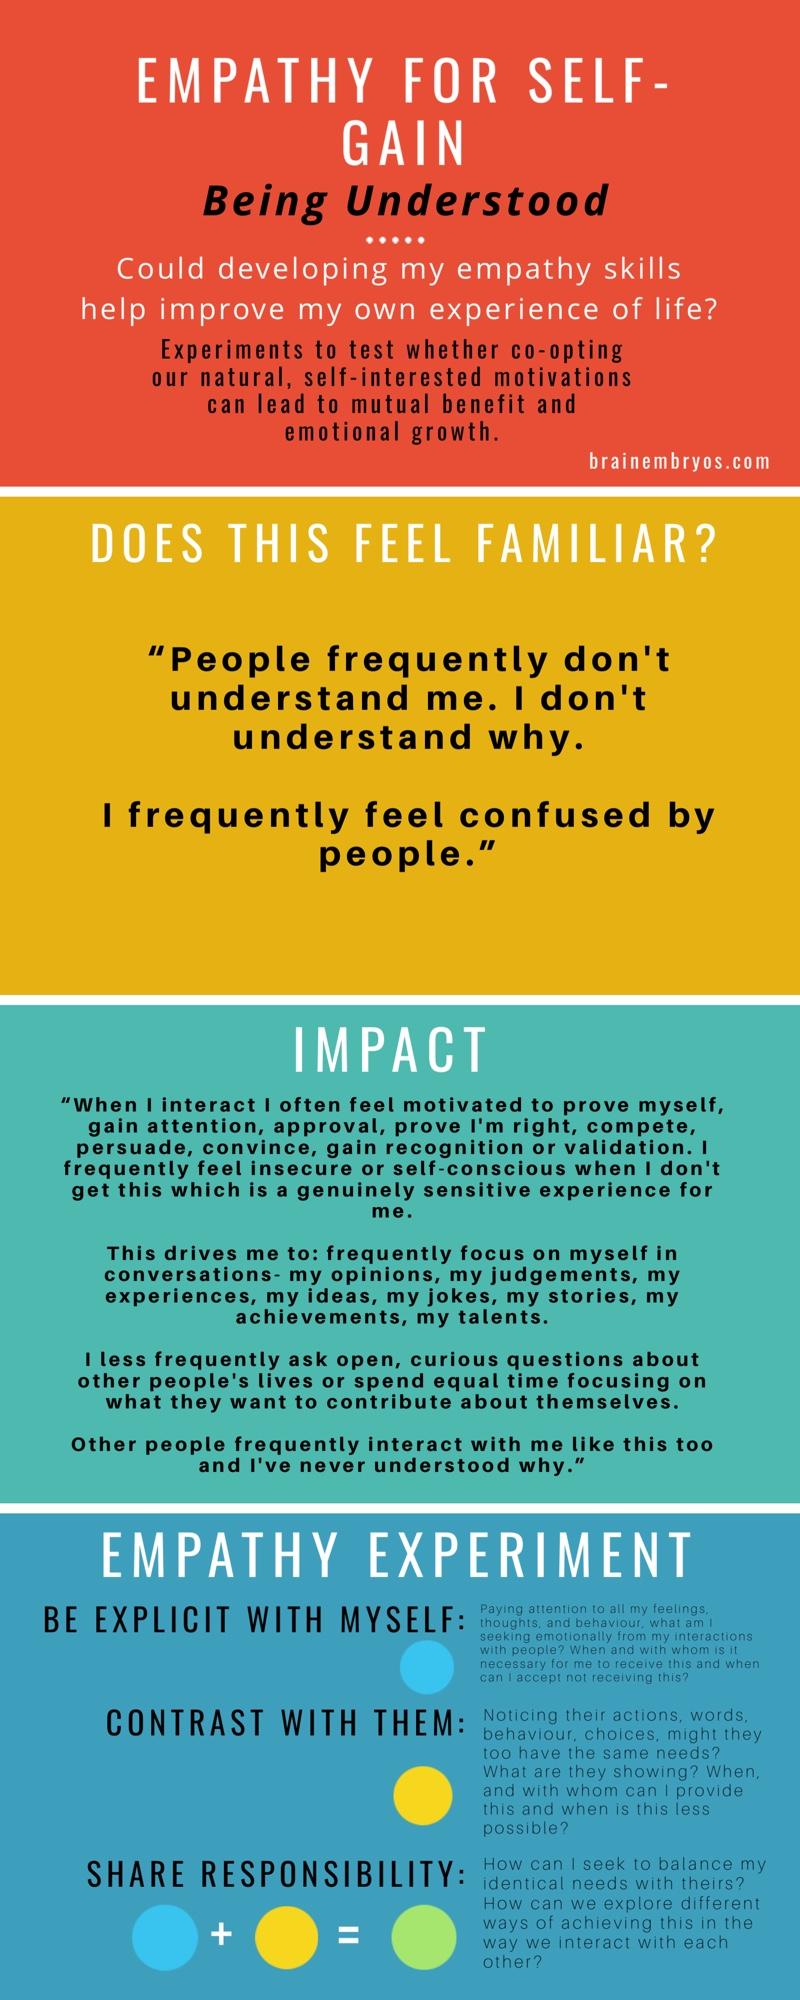 Empathy for Self-Gain: Being Understood.